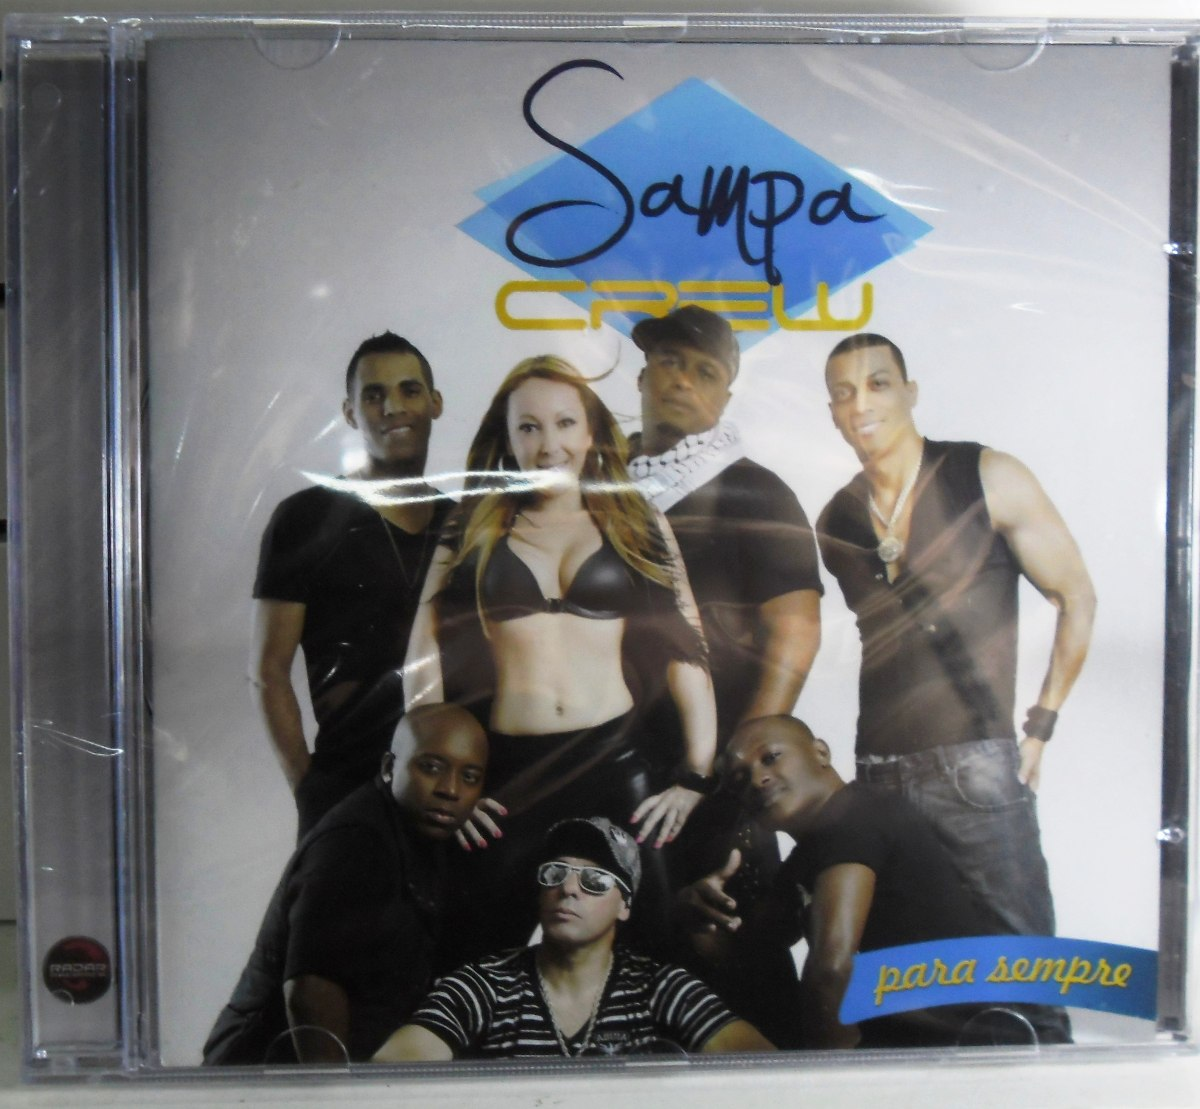 cd sampa crew para sempre 2011